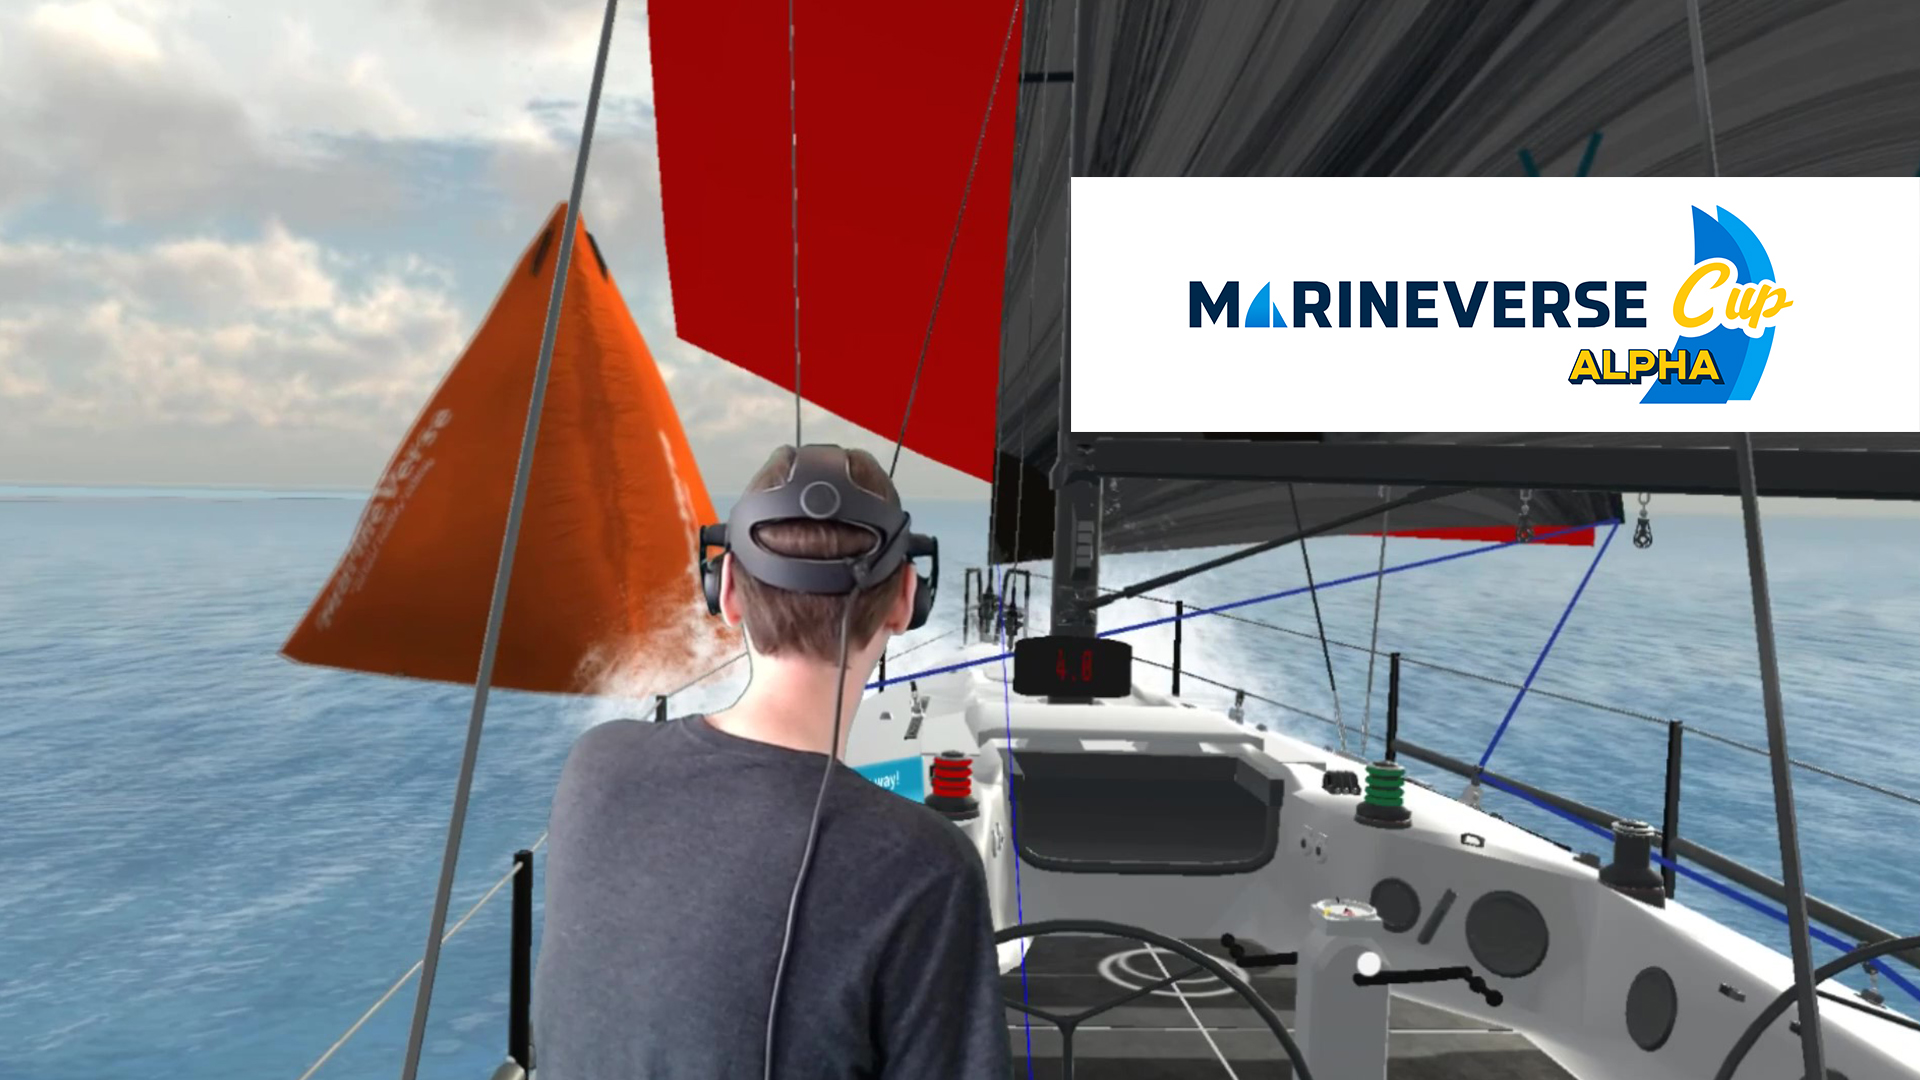 MarineVerse youtube